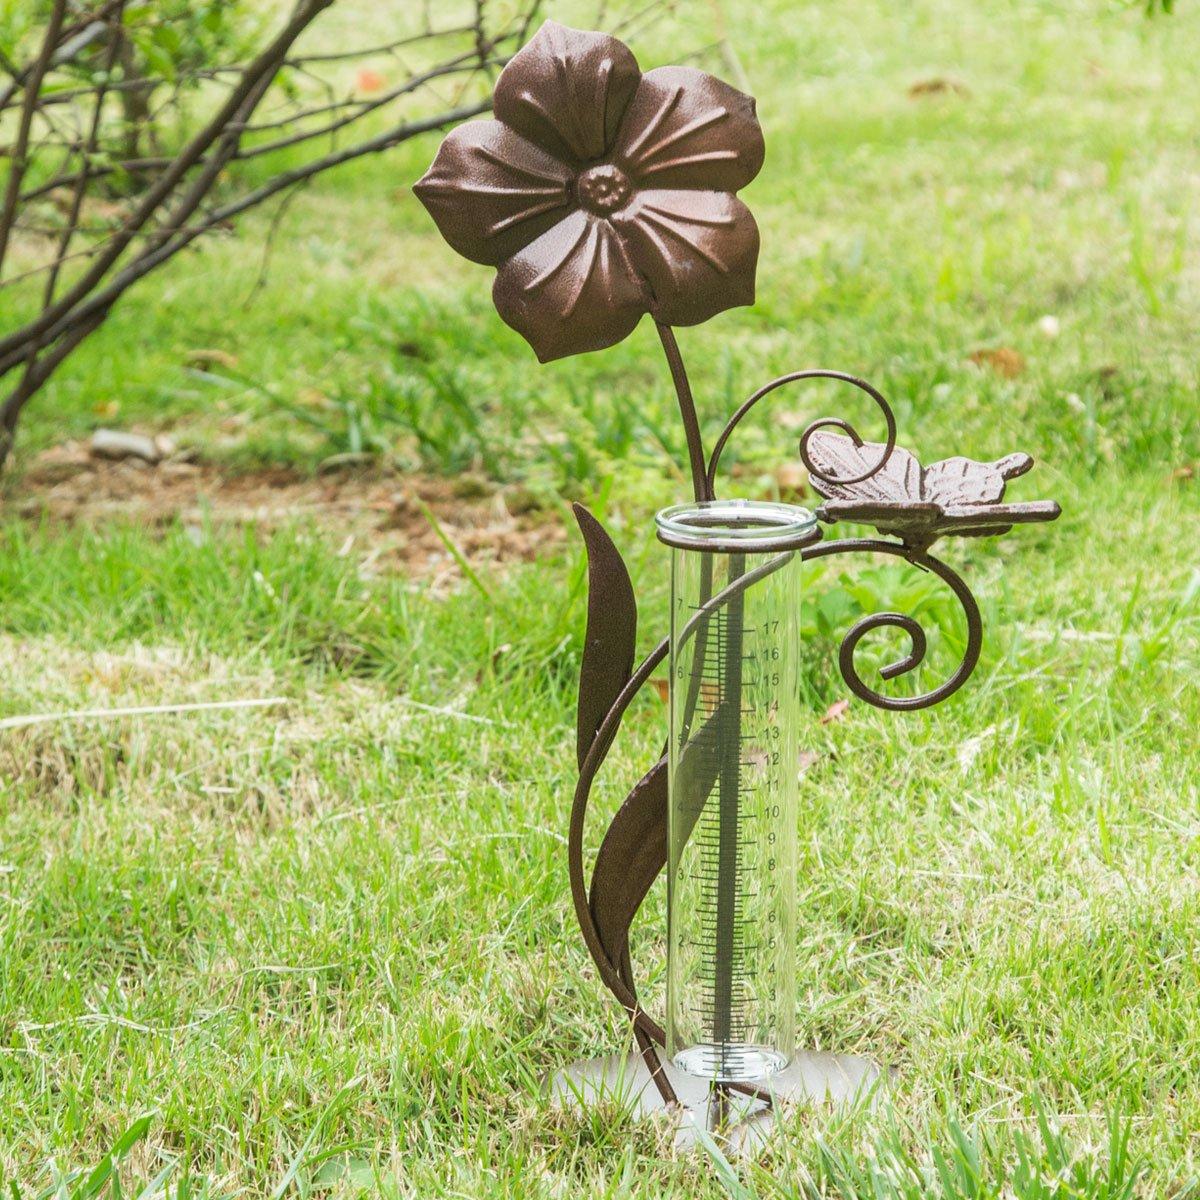 A Ting Garden Decorative 7'' Metal and Glass Rain Gauge,Butterfly,Flower